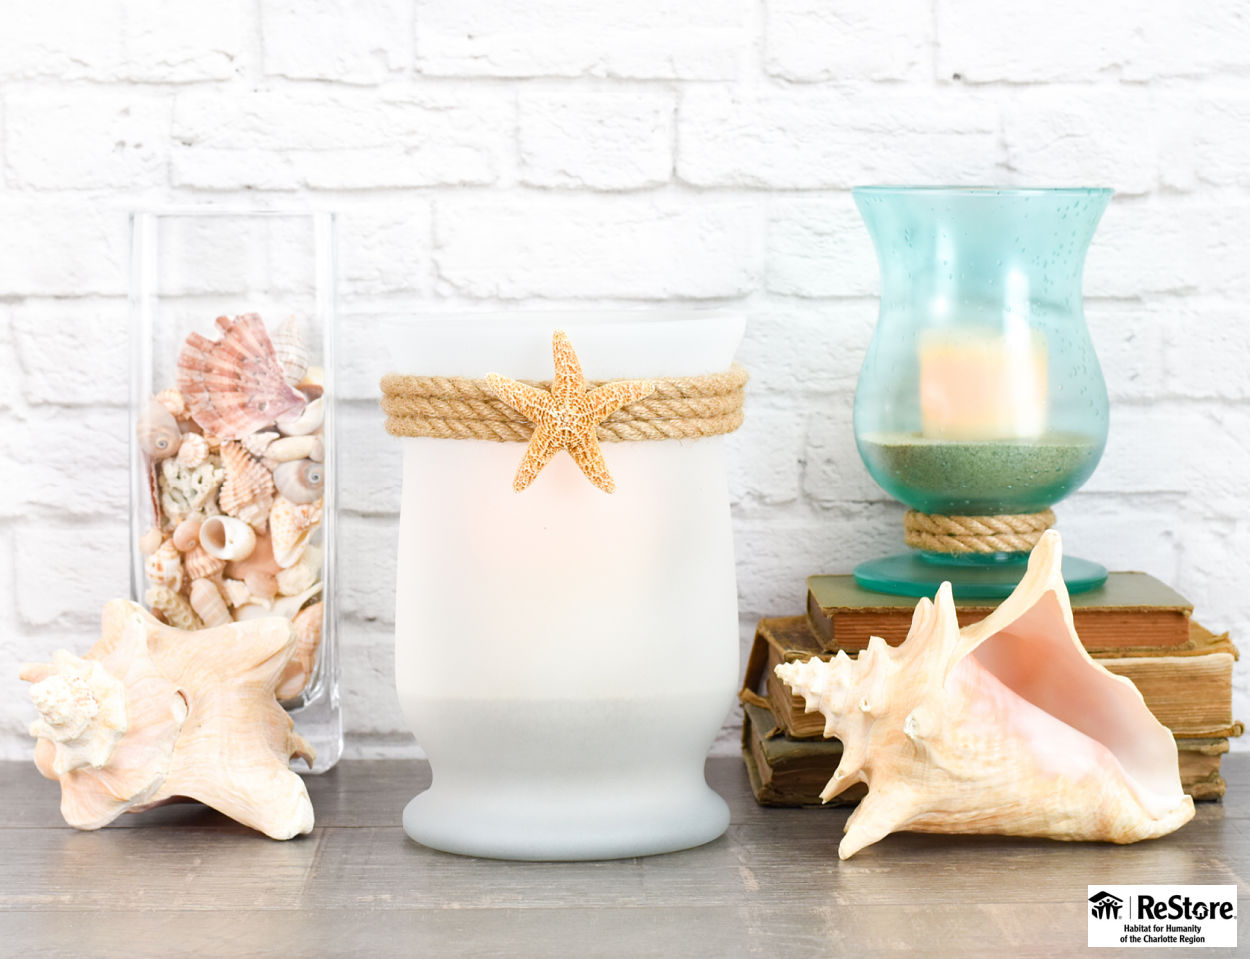 coastal candleholders from habitat restore